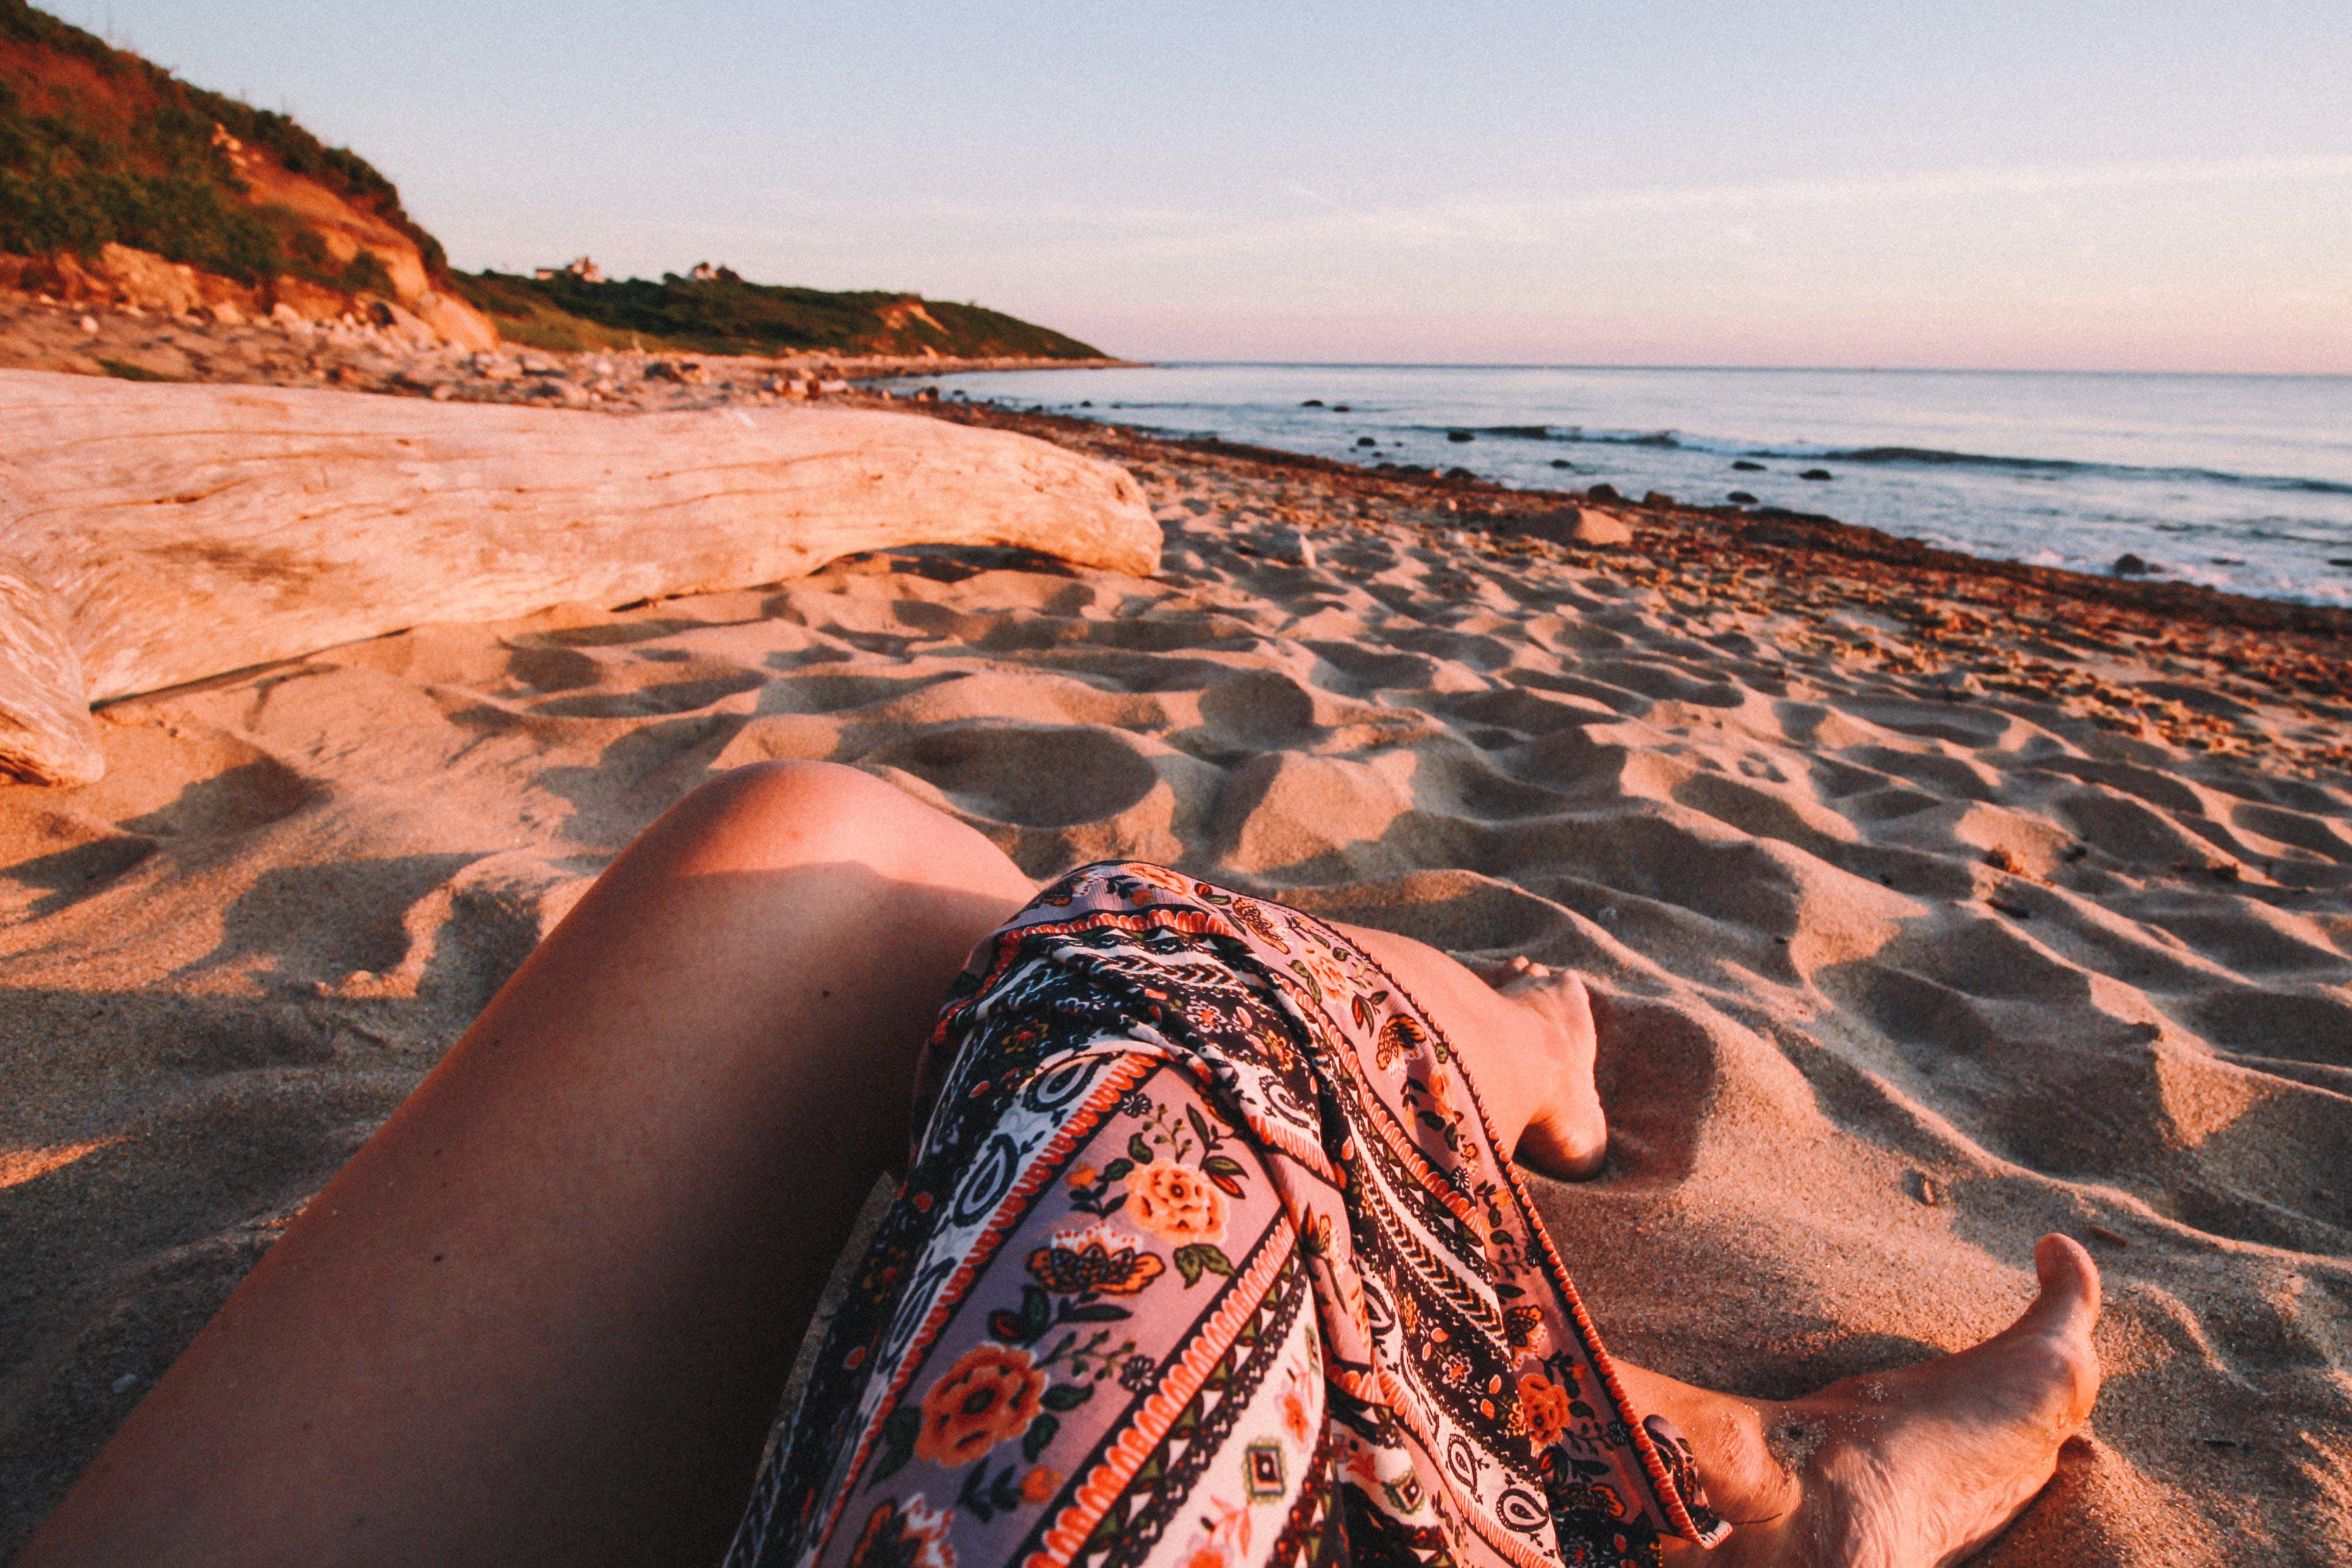 Free stock photo of beach, beach front, beach girl, daydreaming